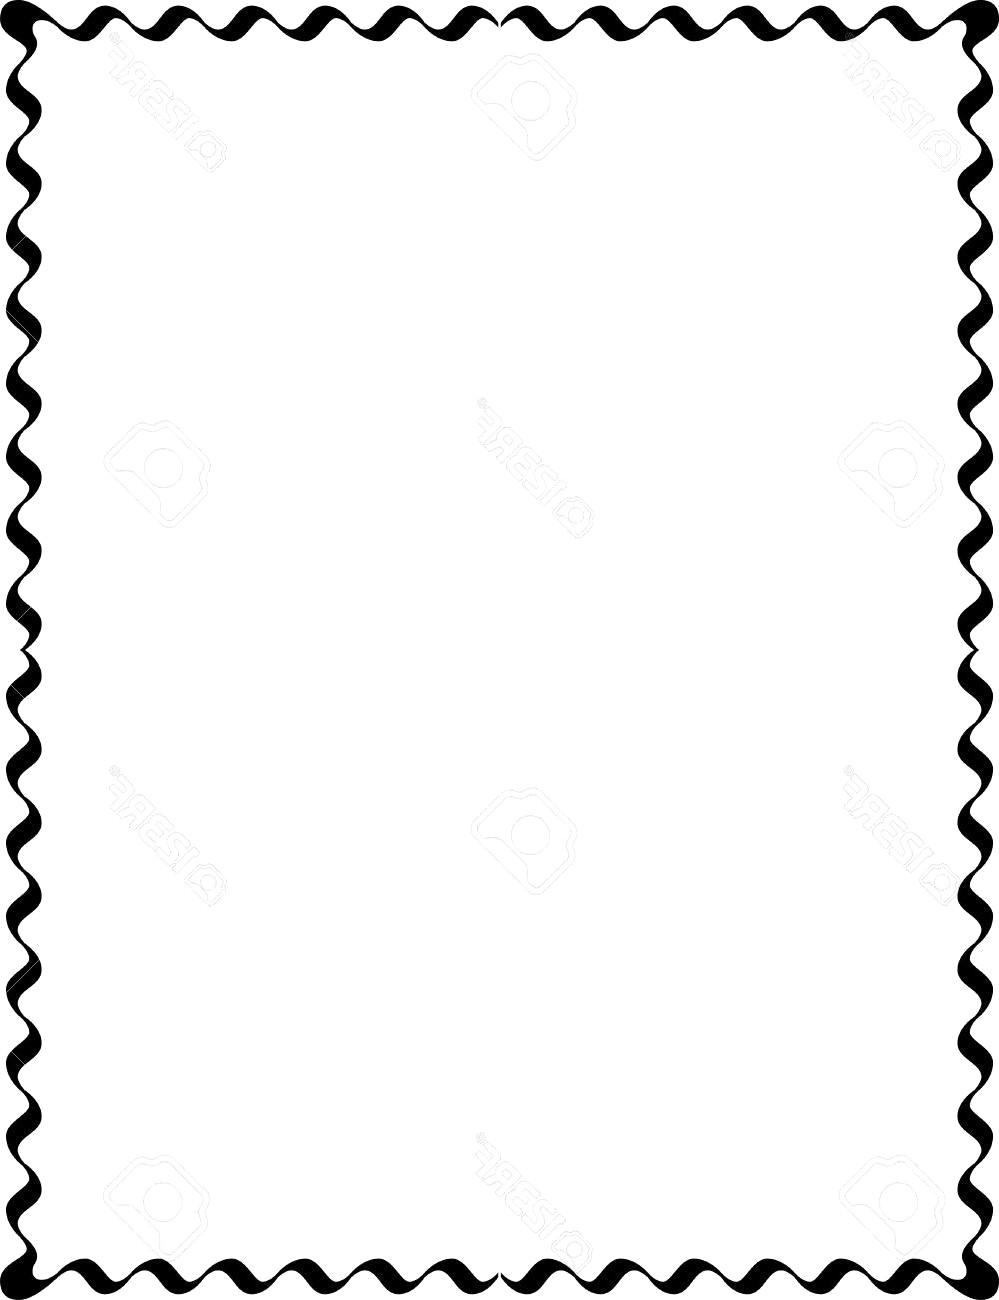 999x1300 Simple Lines Border Frame Vector Design Monochrome 11 Designs